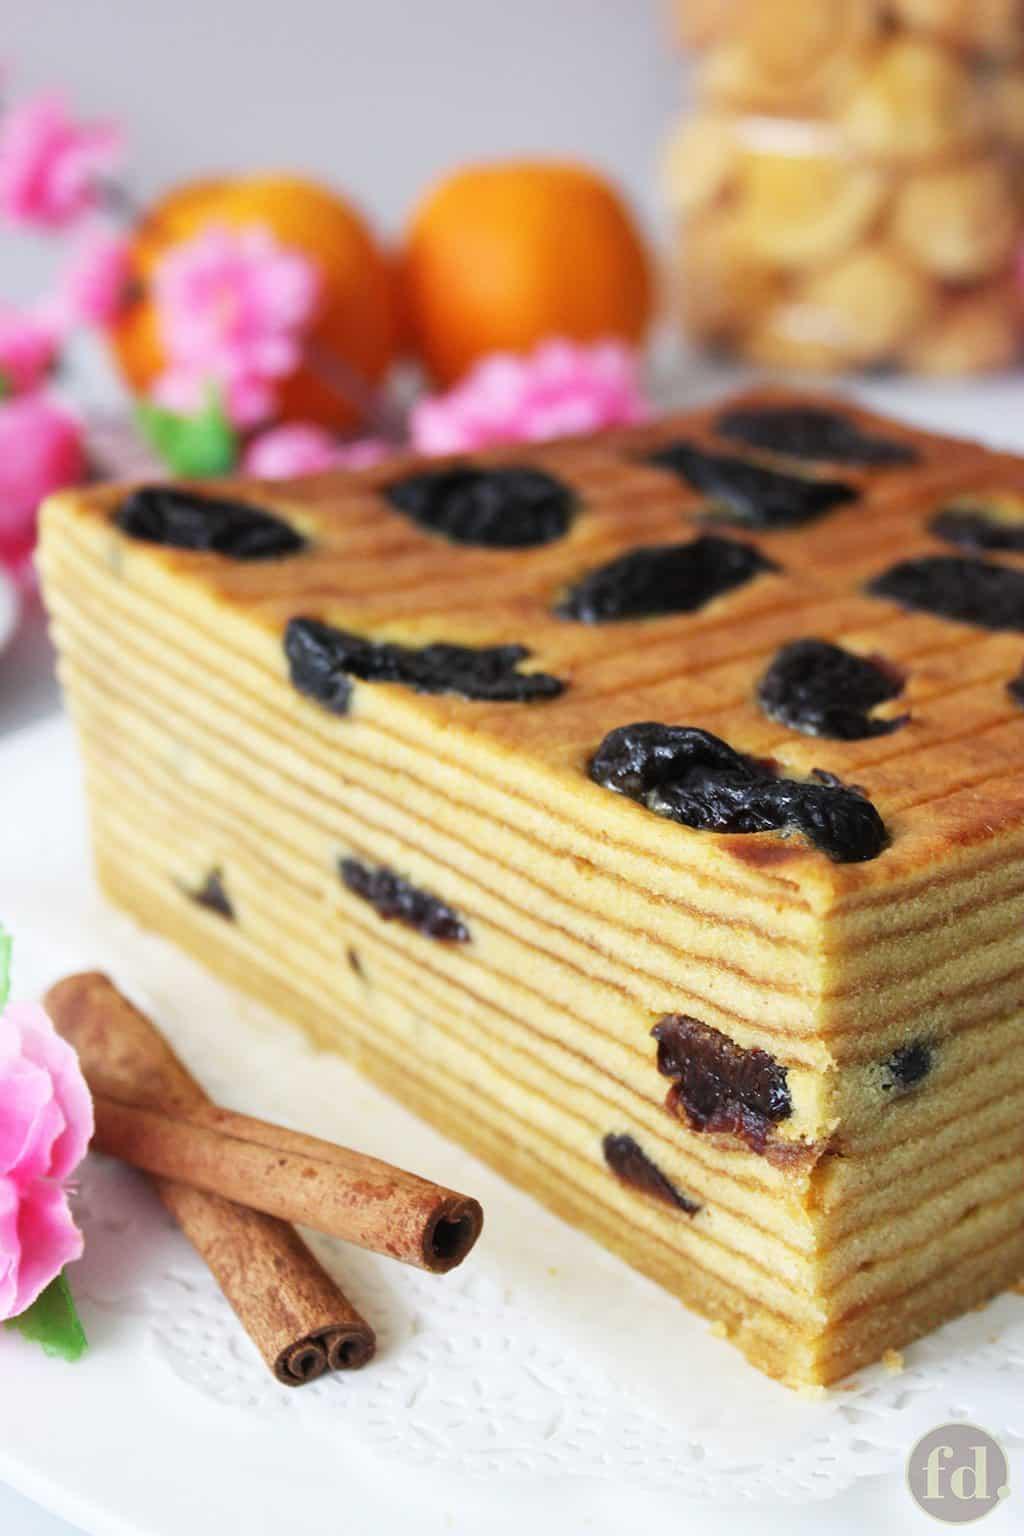 indonesian prune layer cake (prune lapis cake)